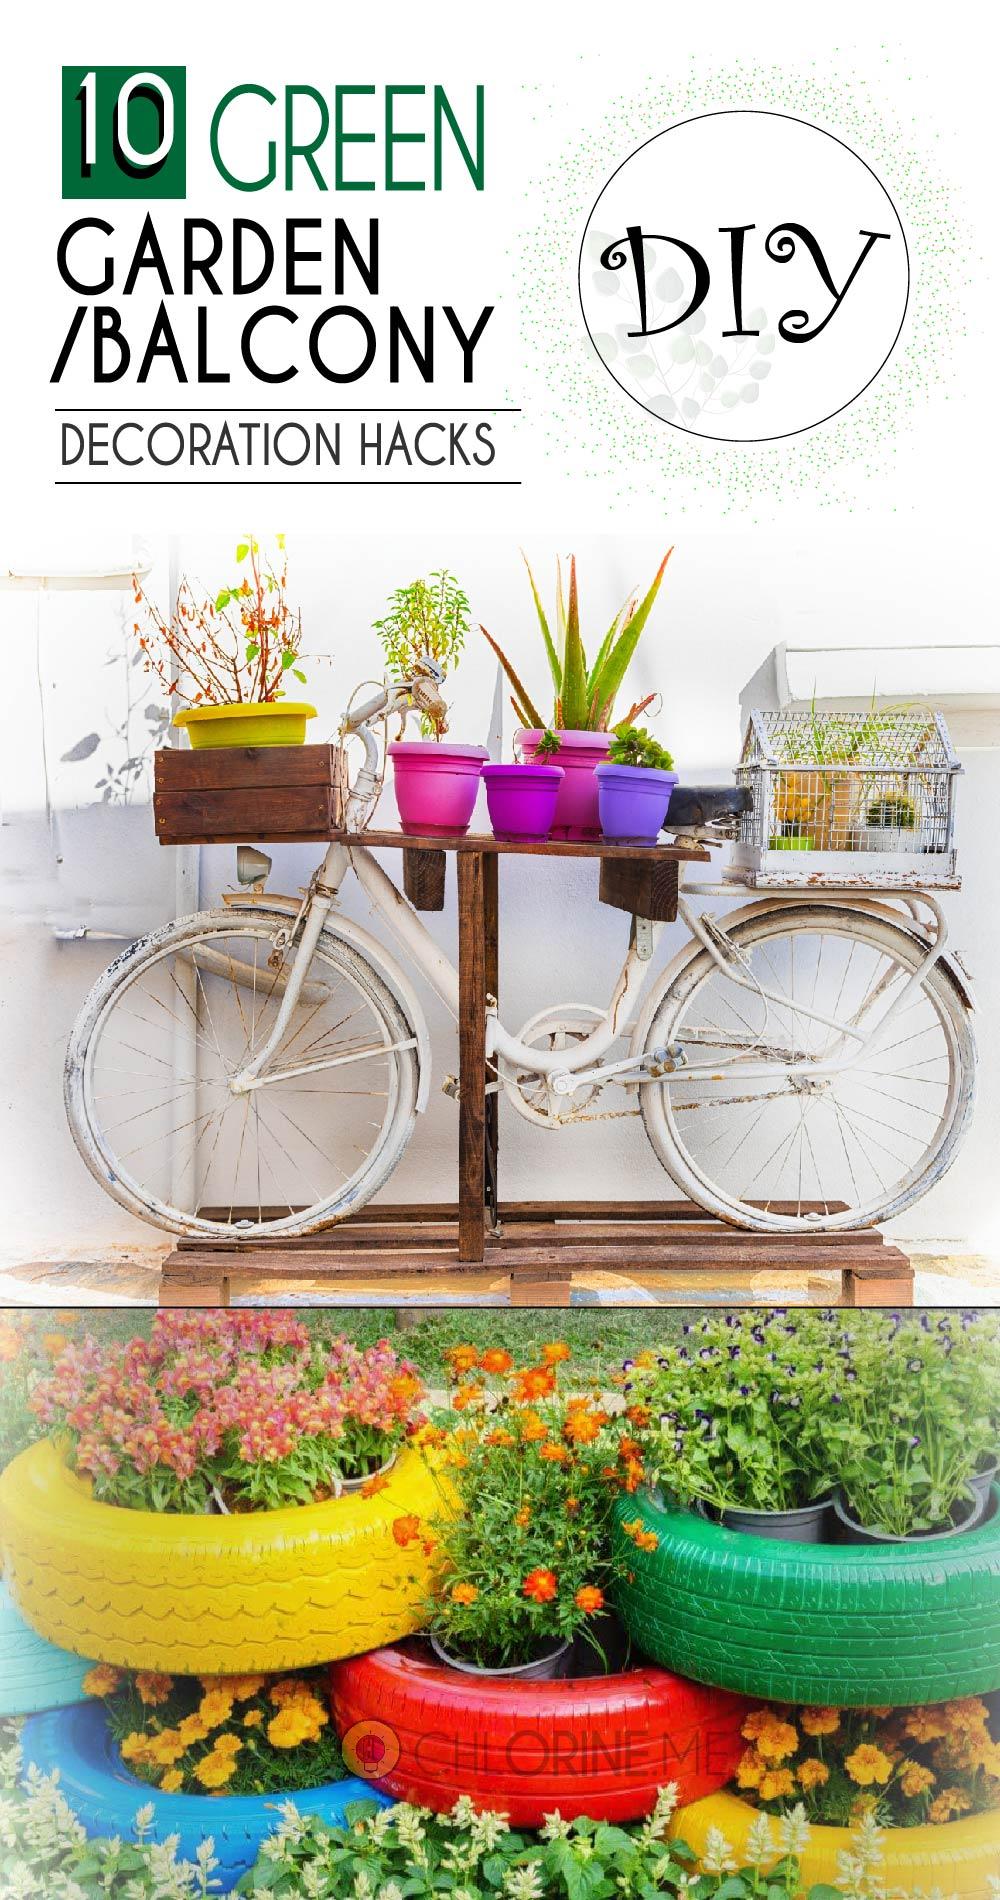 10 GREEN GARDEN AND BALCONY DECORATION IDEAS-01